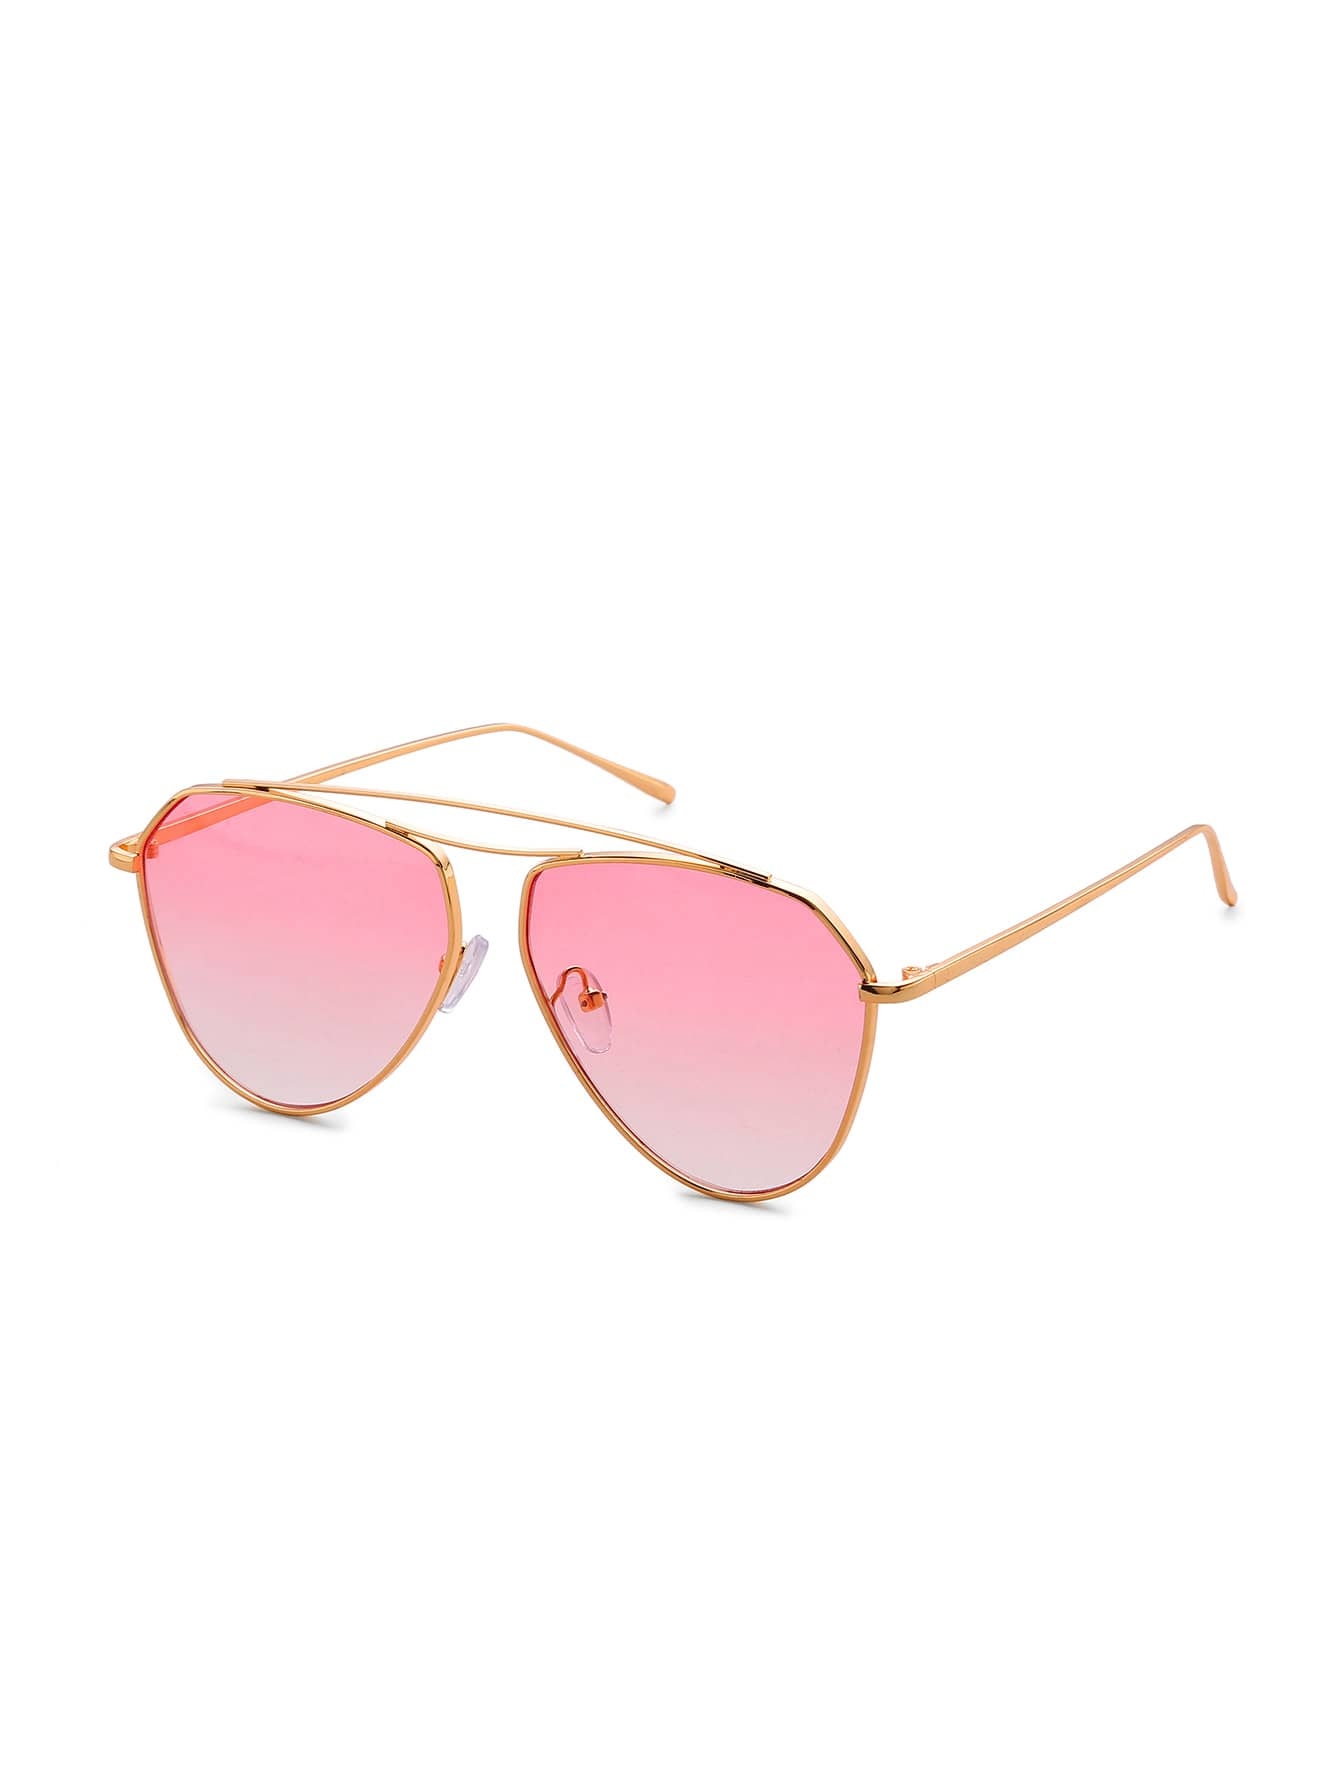 Double Top Bar Oval Lens Sunglasses